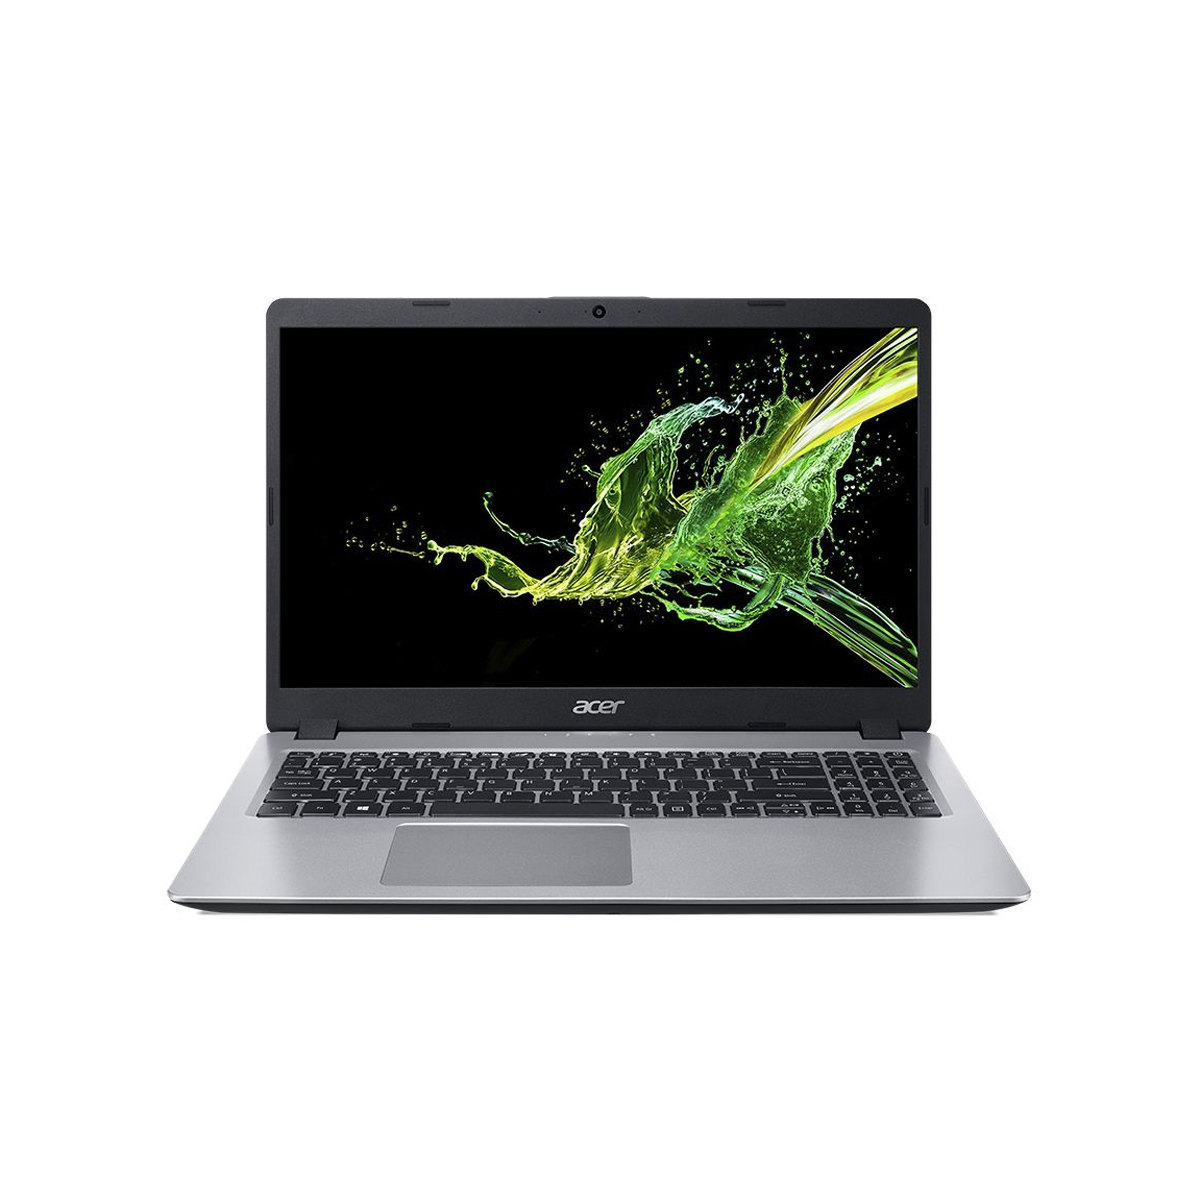 Notebook Acer A515 Core I5 8265u Memoria 8gb Ddr4 Ssd 120gb Tela 15.6' Led Hd Sistema Windows 10 Home